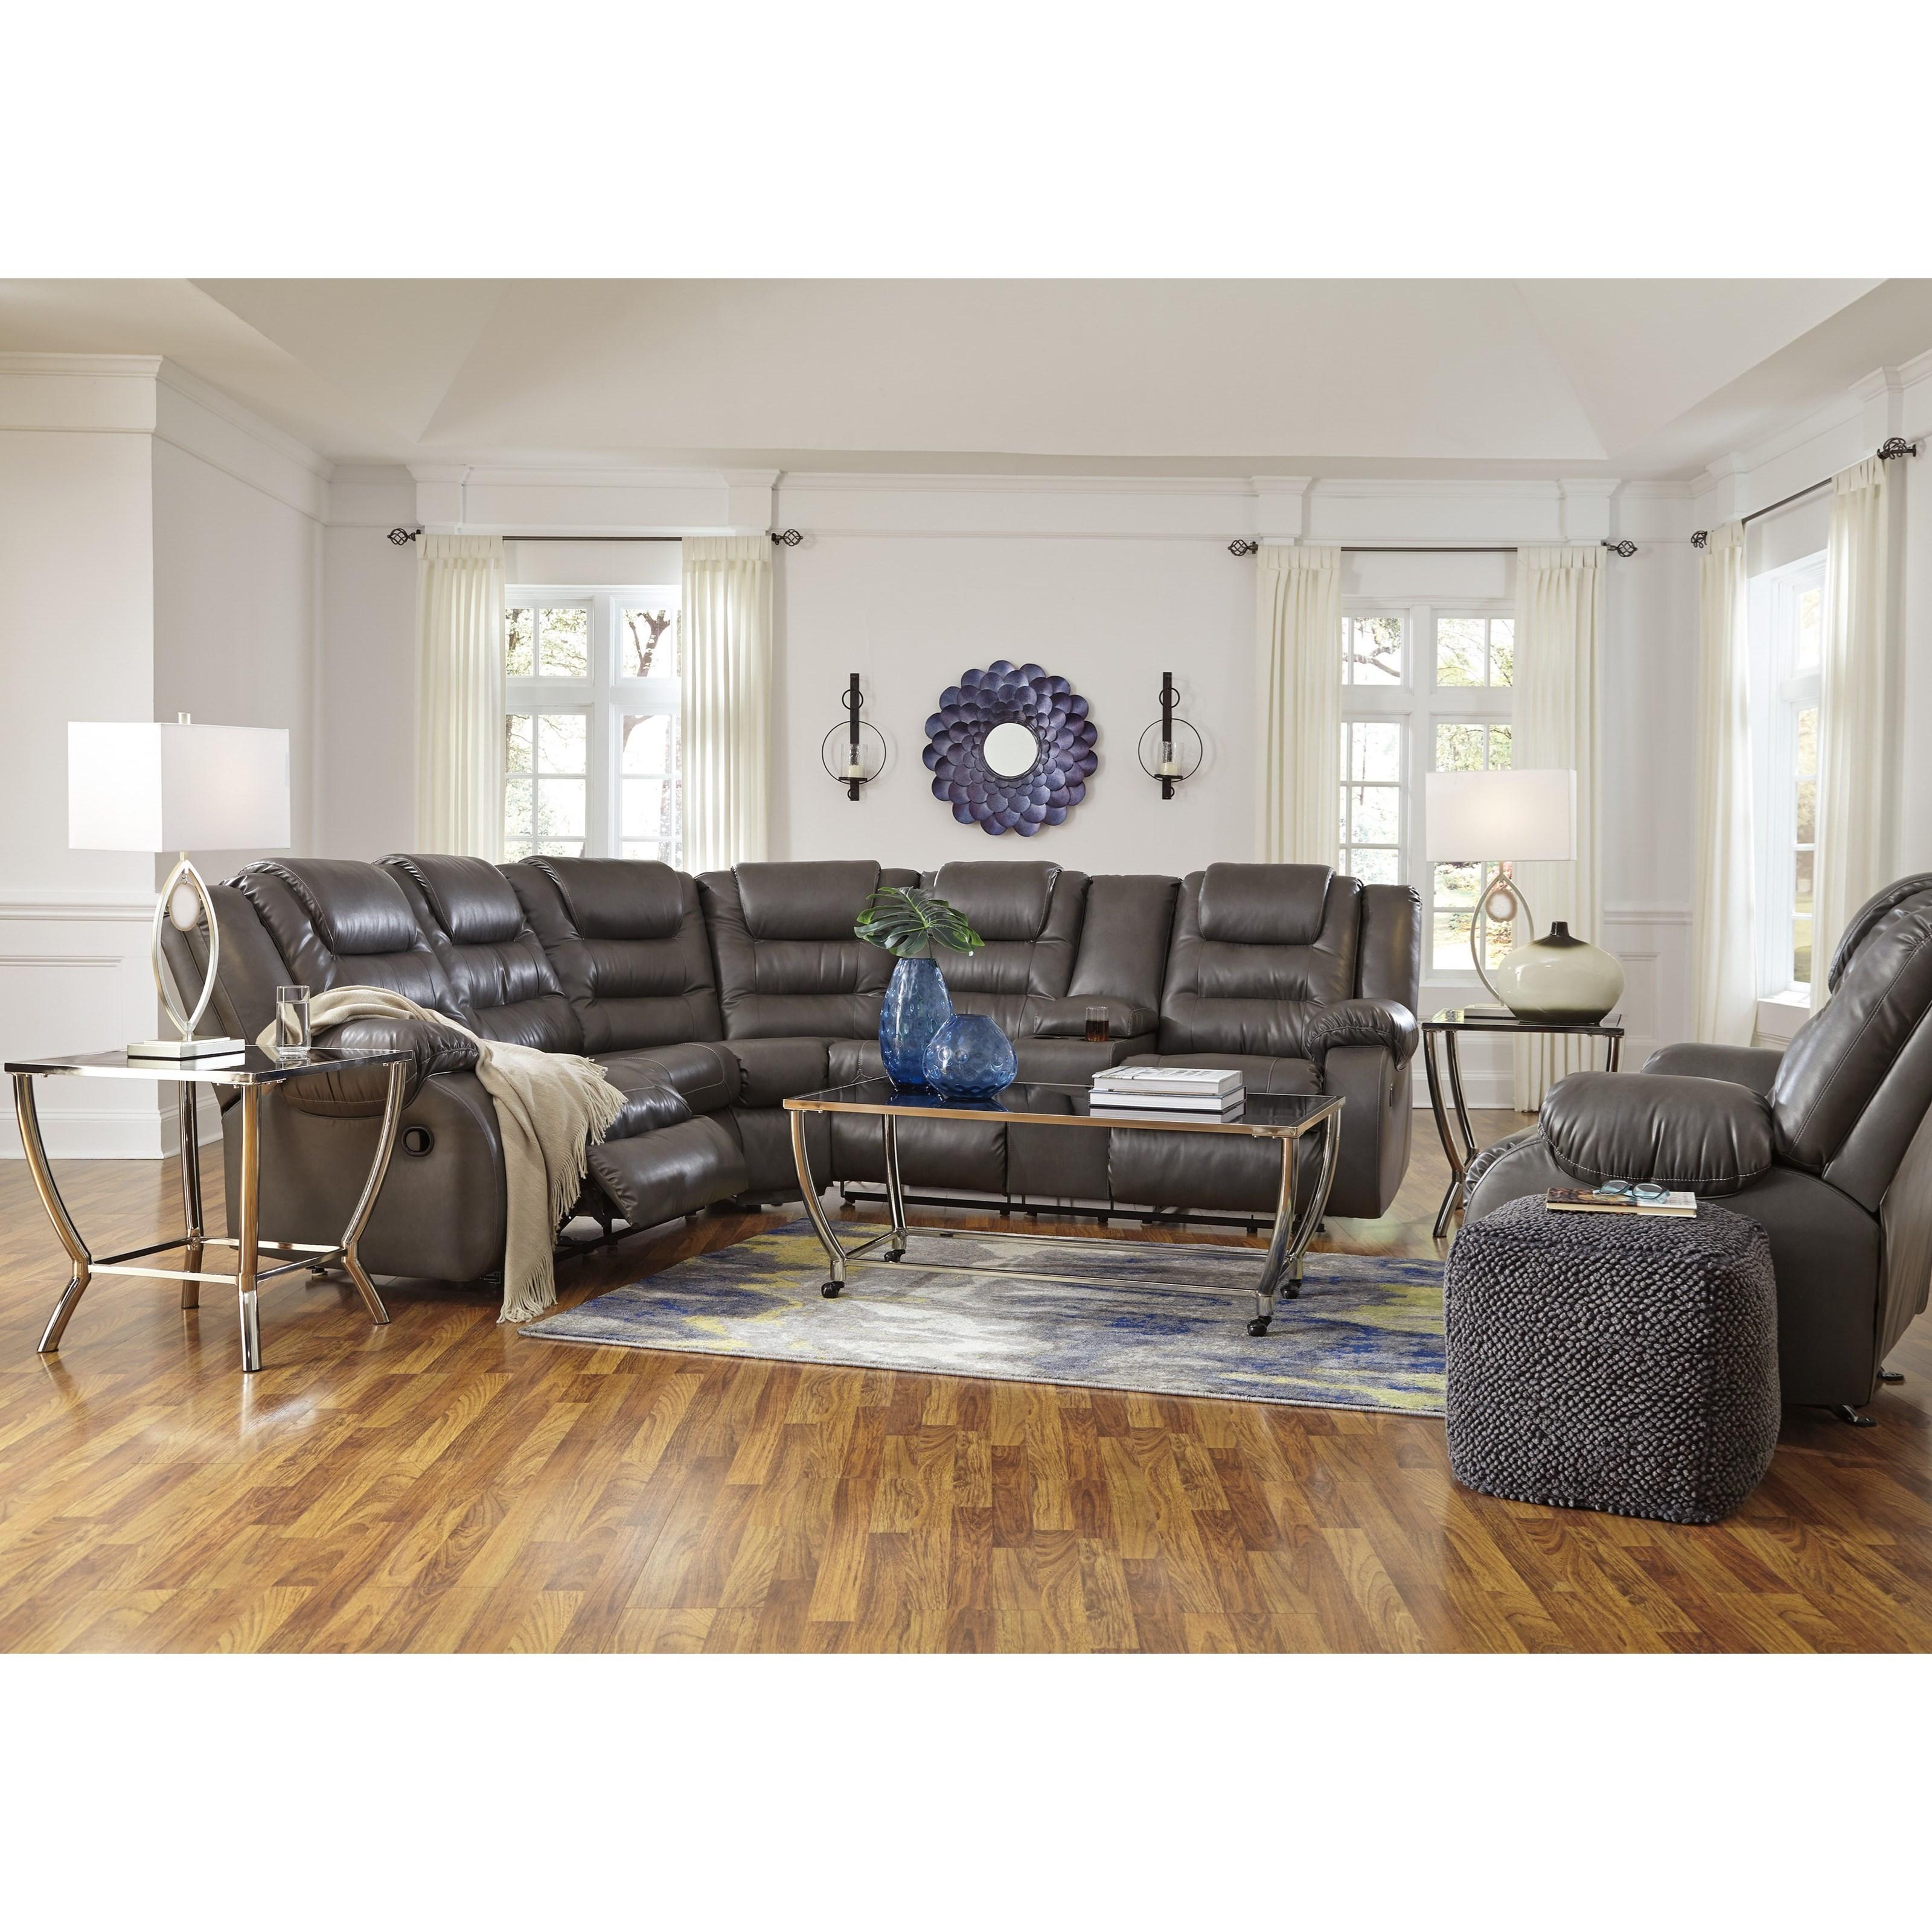 https://images.furnituredealer.net/img/products%2Fsignature_design_by_ashley%2Fcolor%2Fwalgast_38102%20reclining%20living%20room%20group-b1.jpg